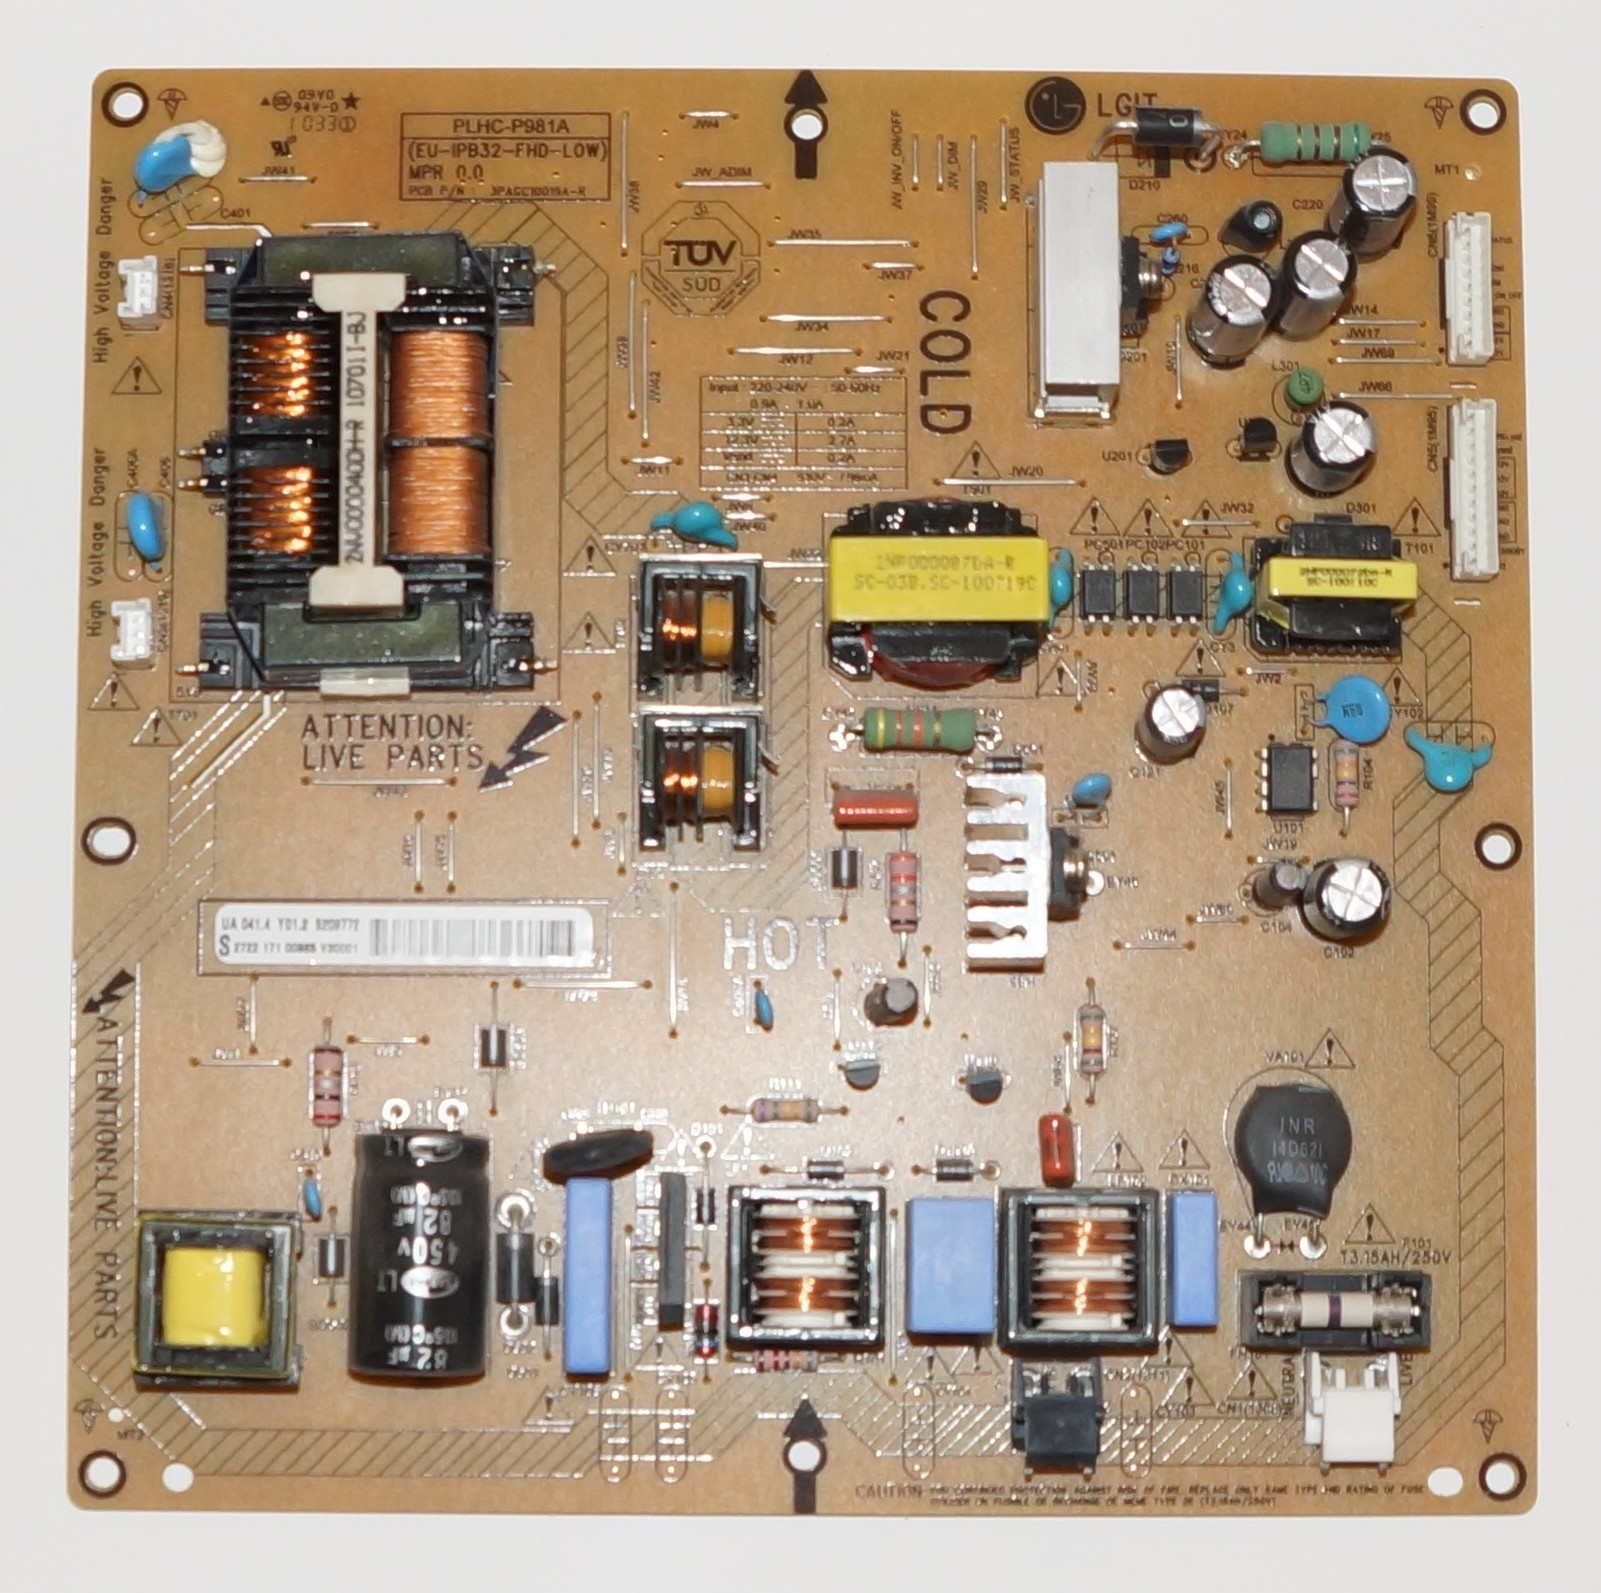 PLHC-P981A 3PAGC10019A 2722 171 00965 блок питания телевизора Philips